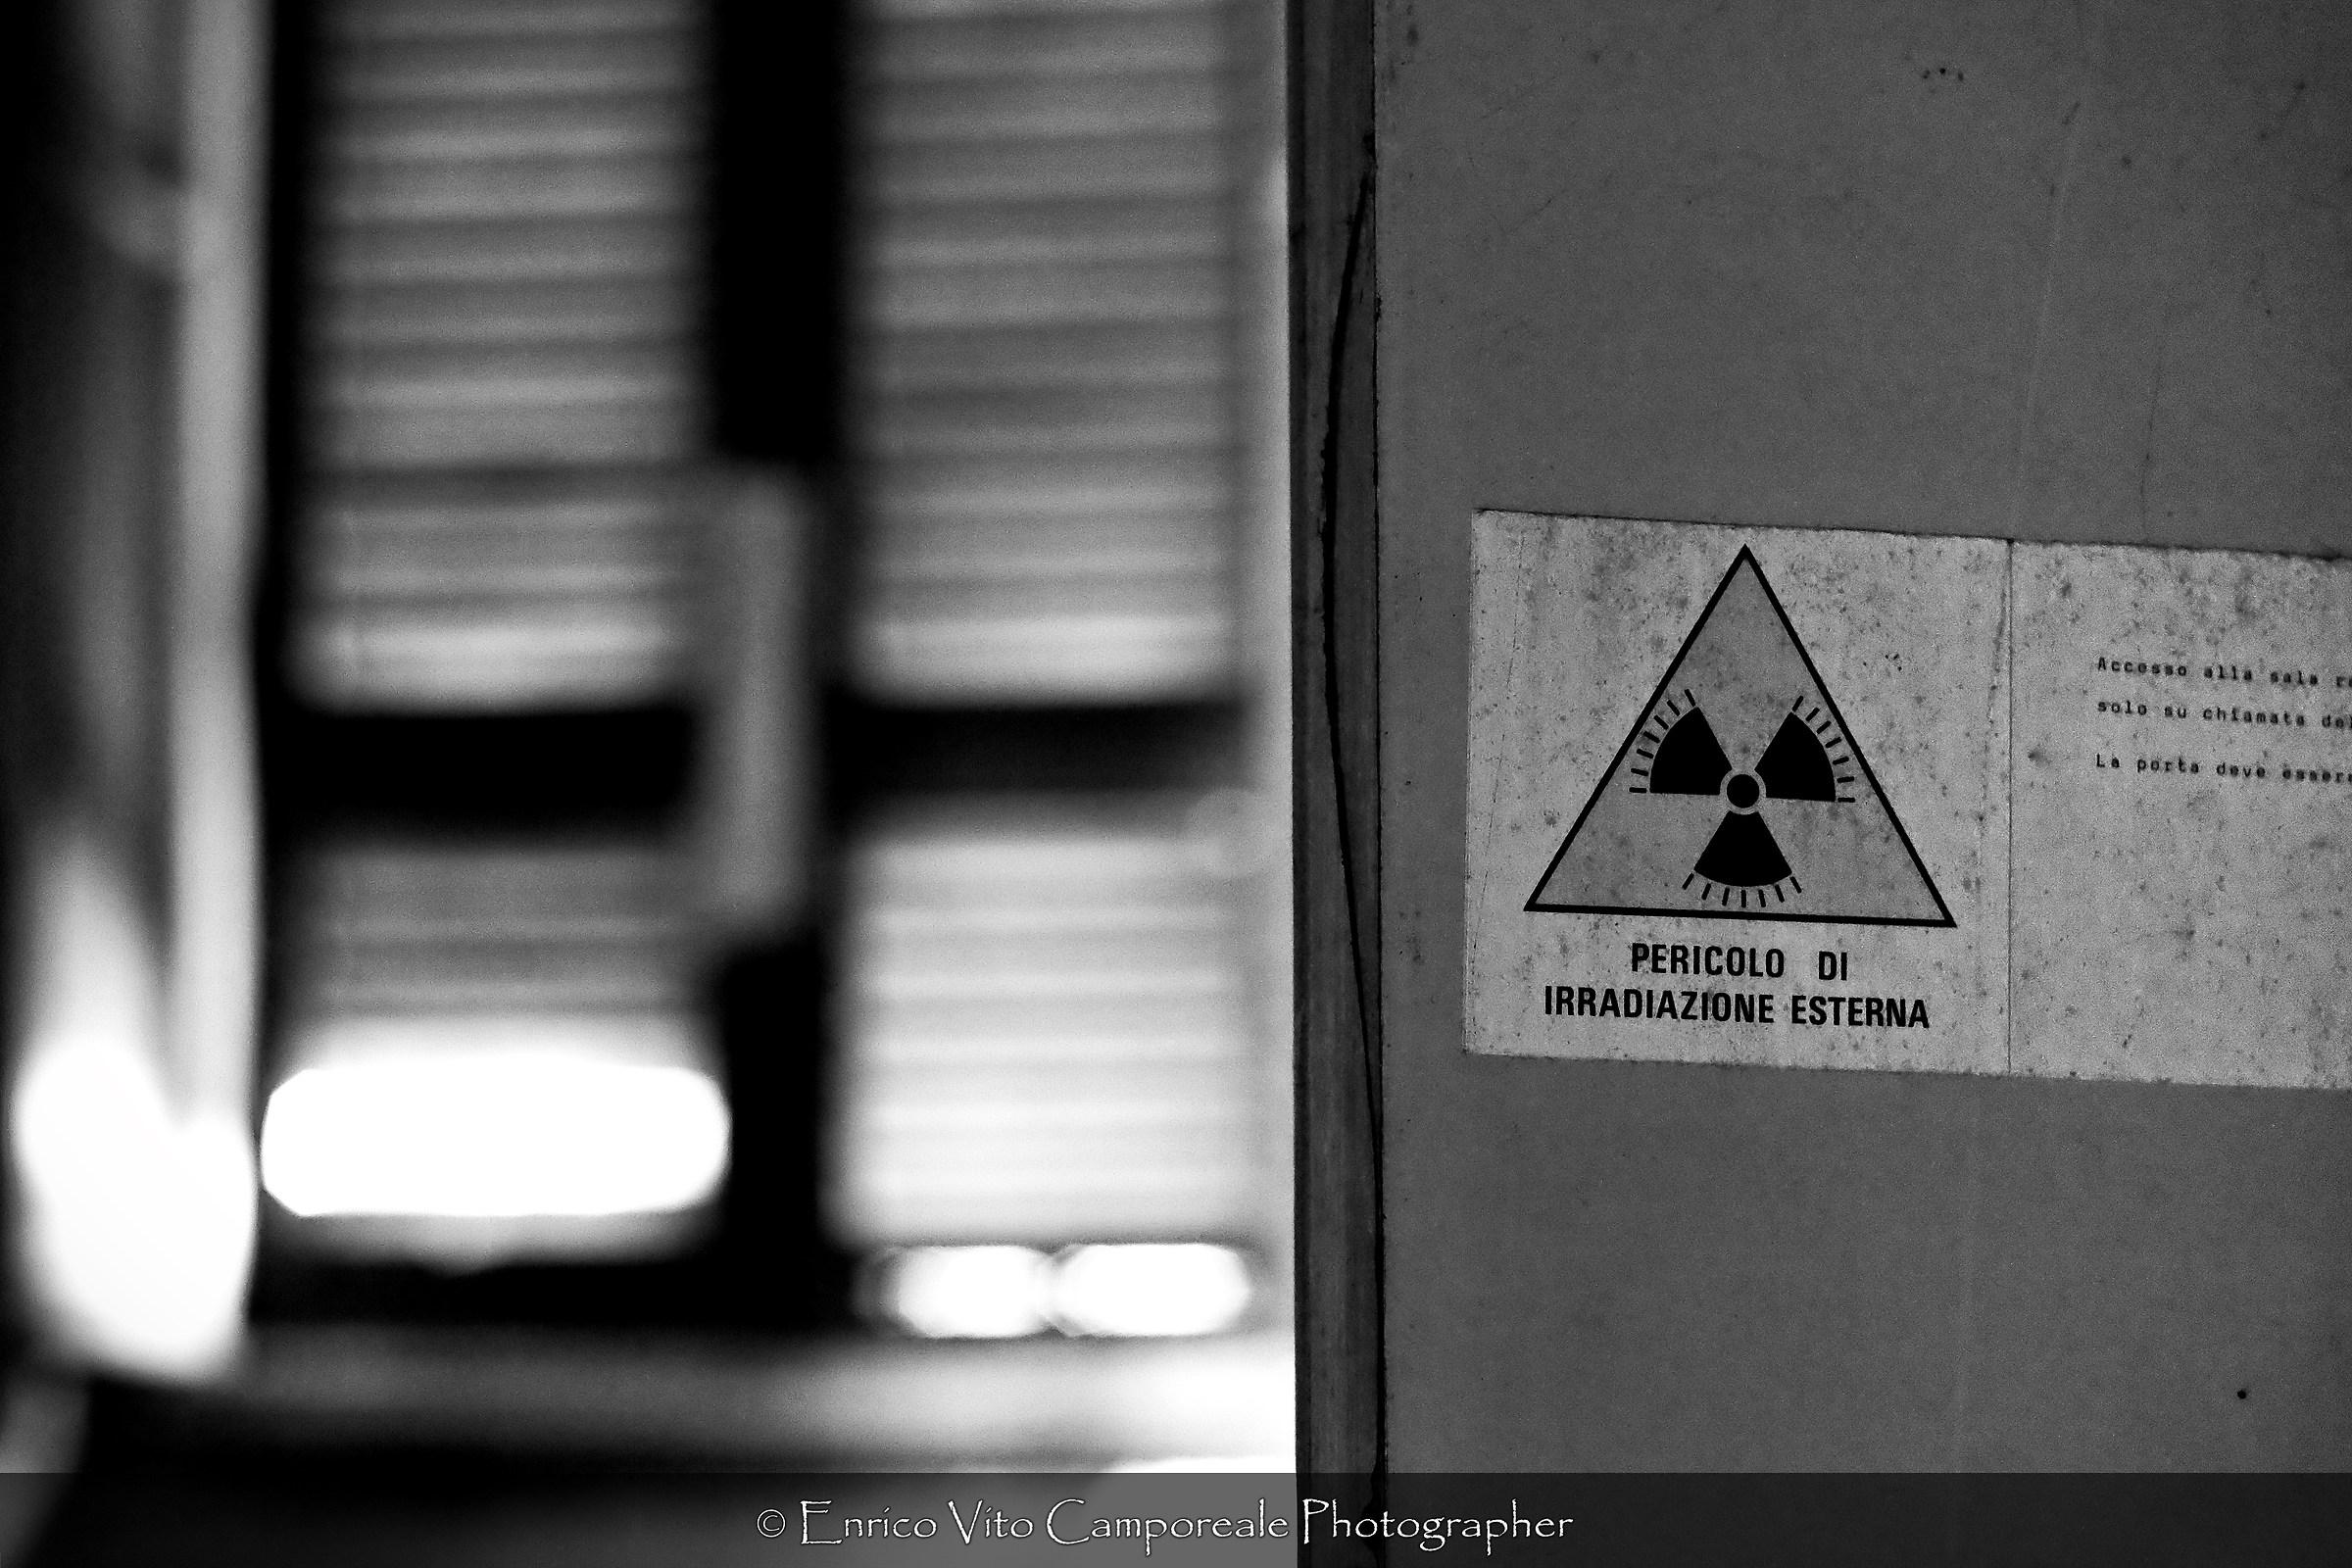 Irradiation...